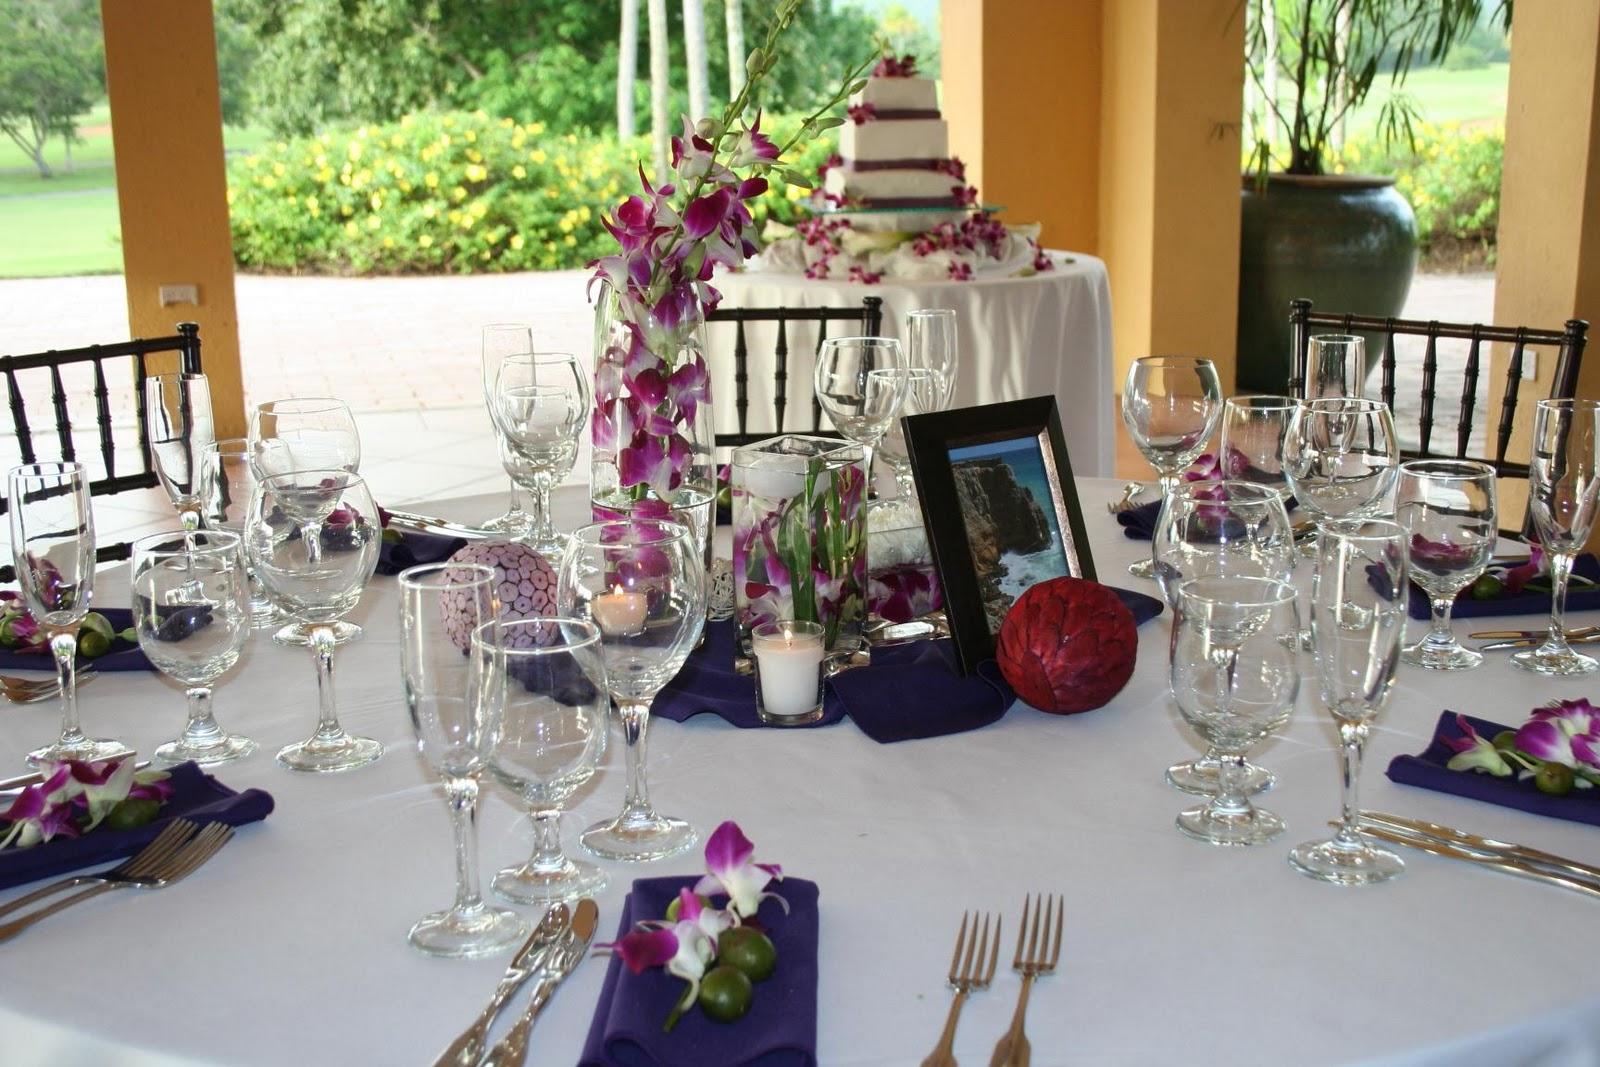 Wedding Cakes Prices - Wedding